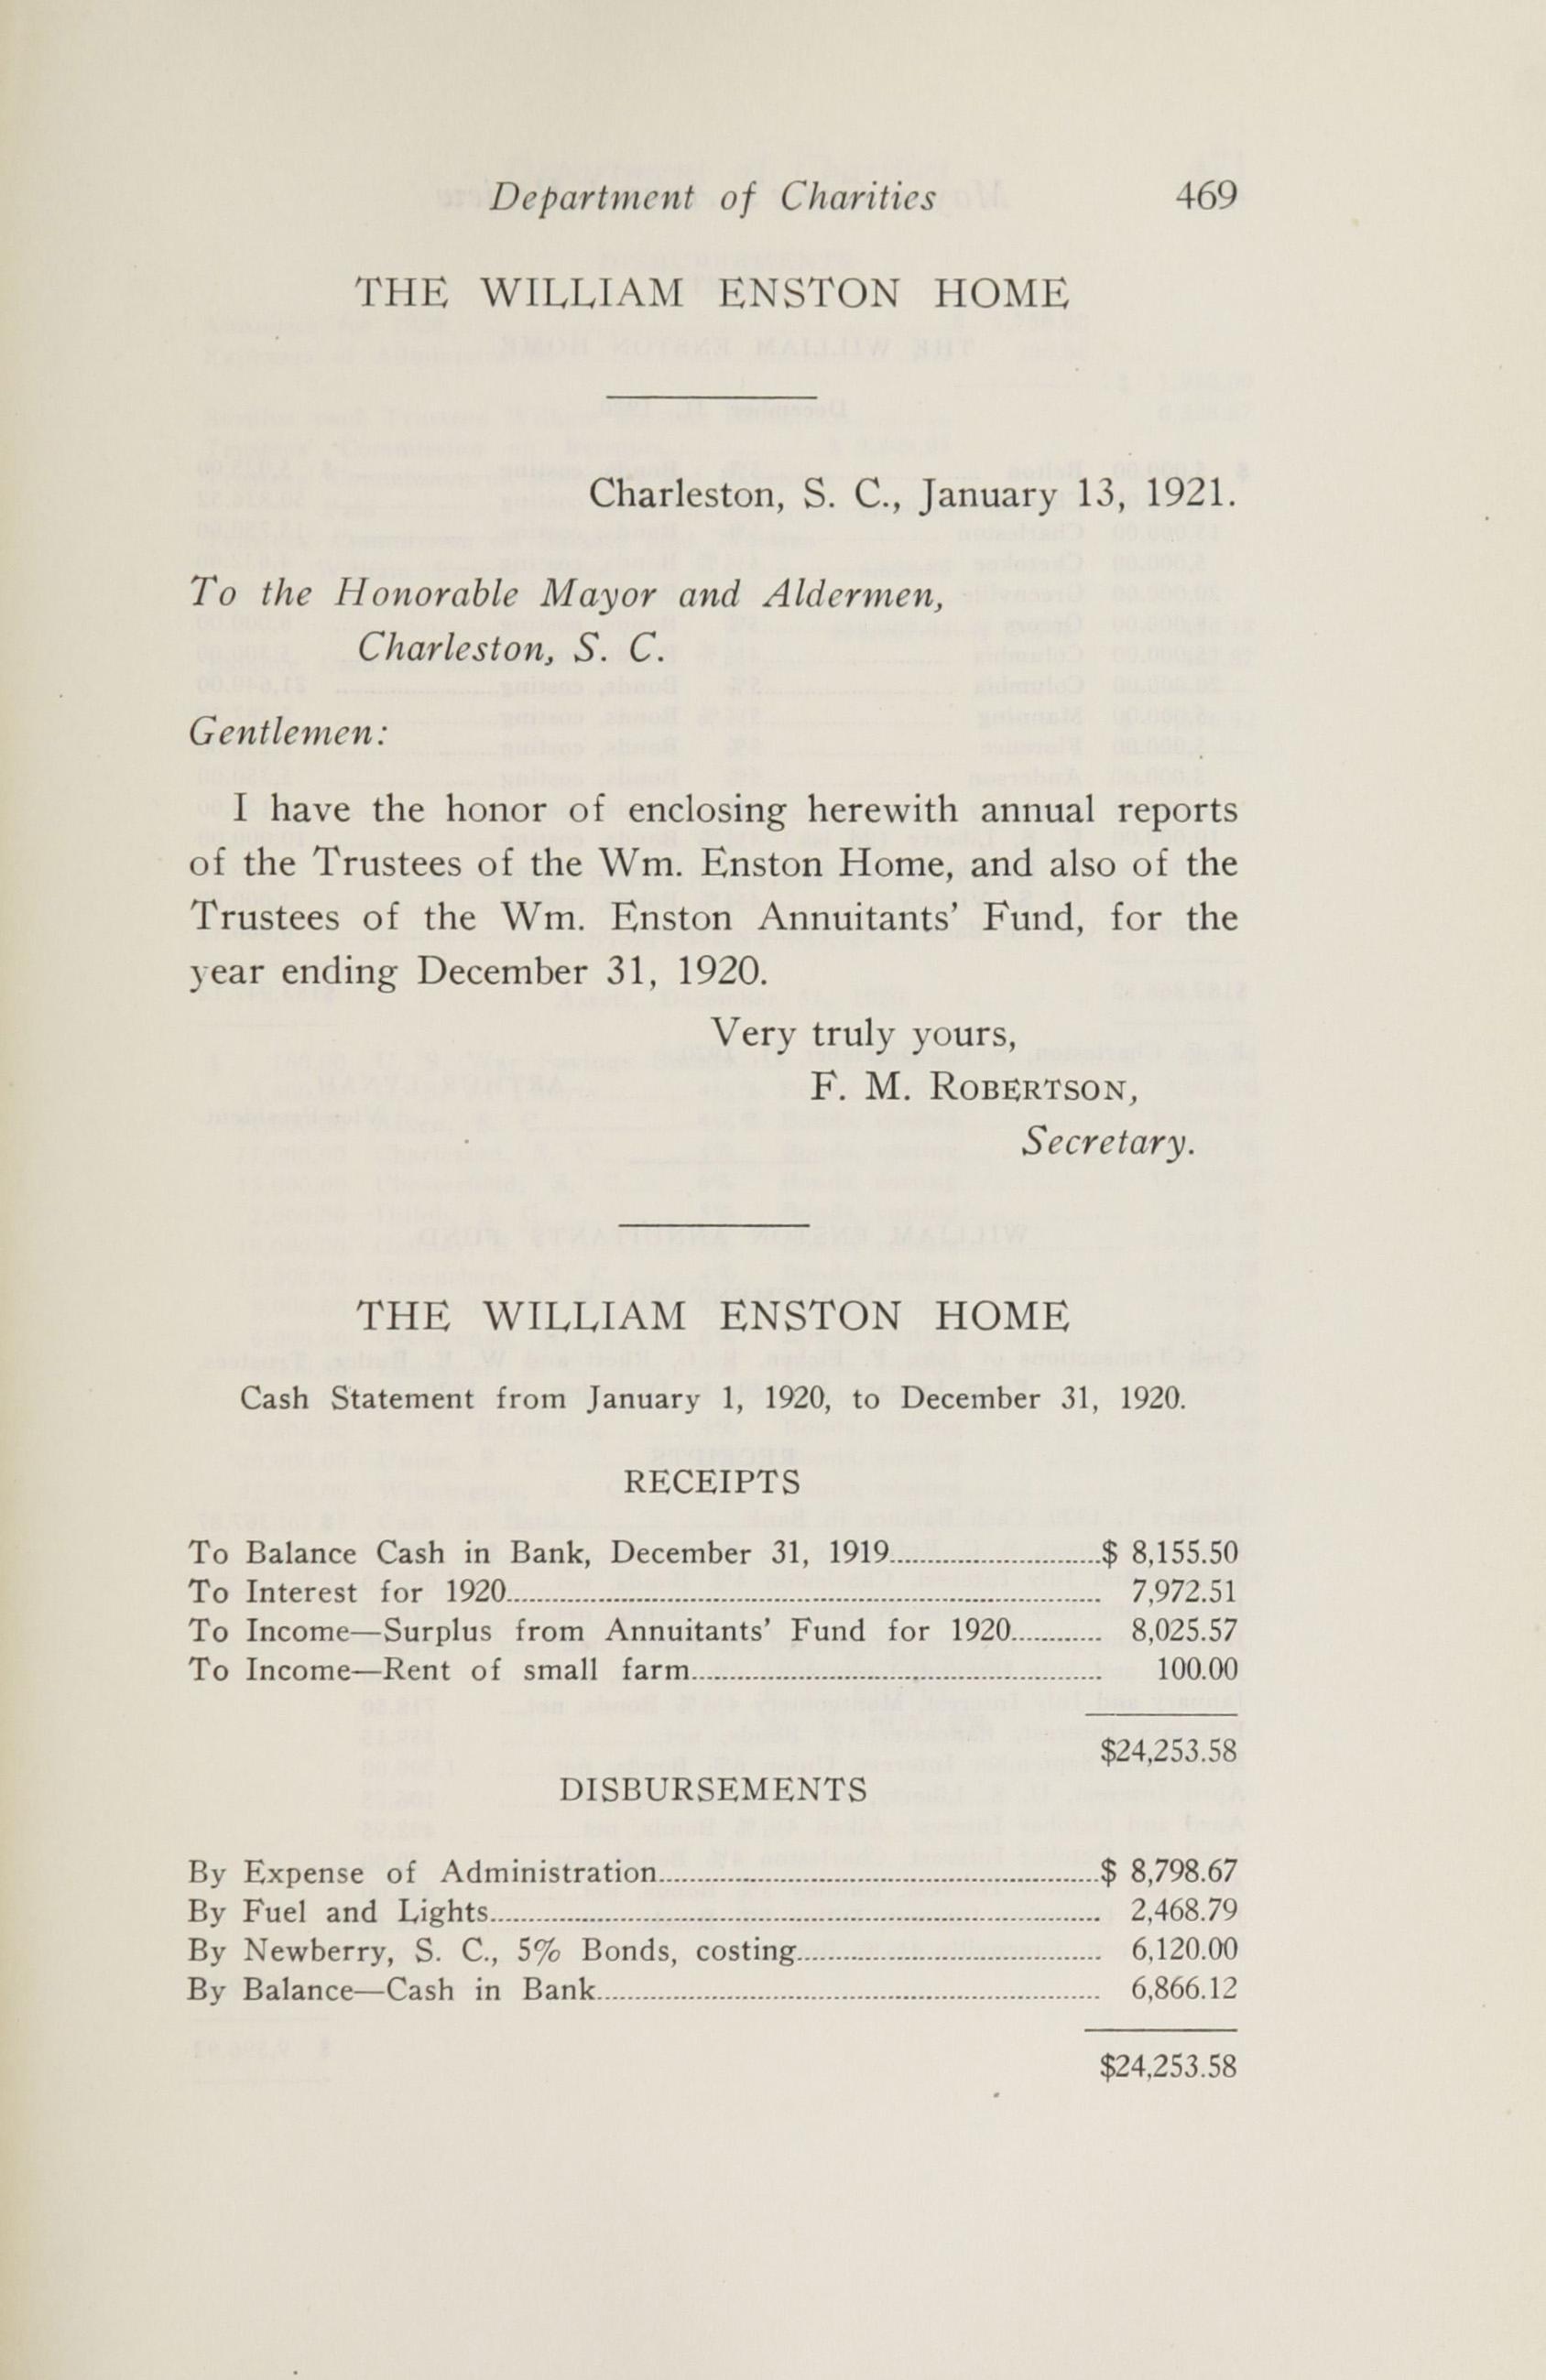 Charleston Yearbook, 1920, page 469